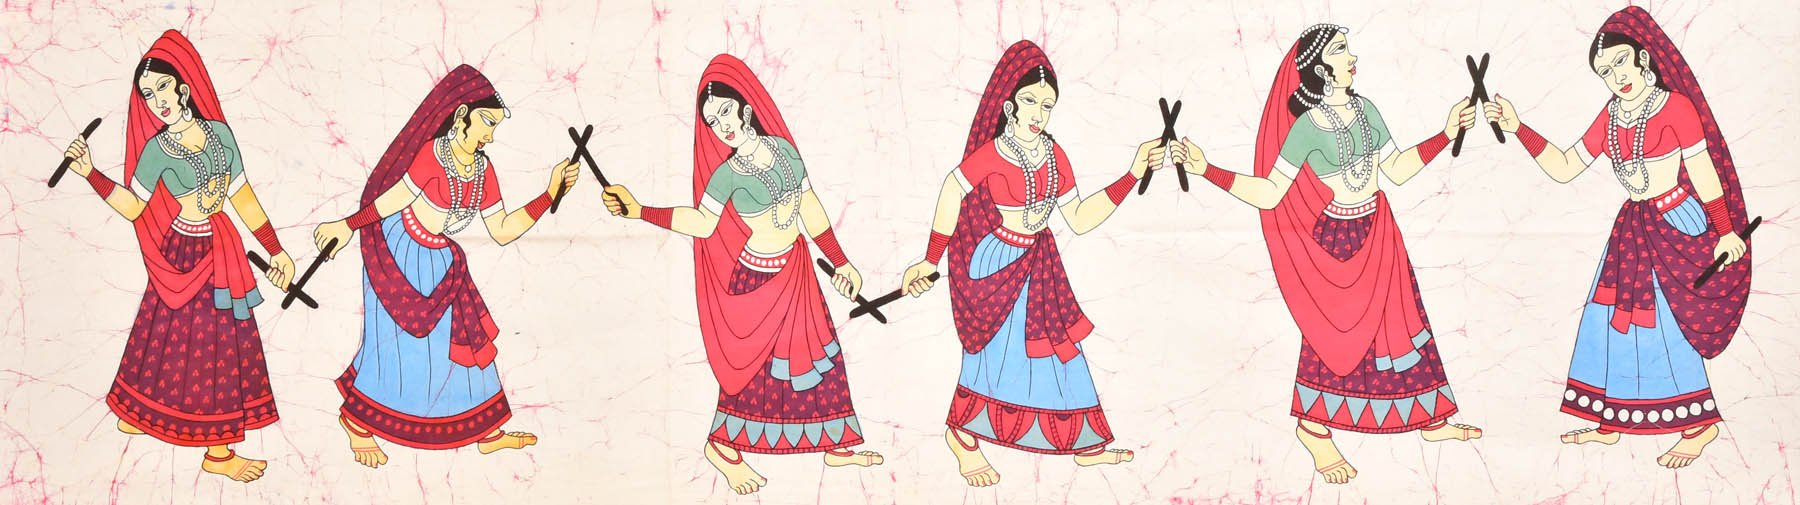 Daandia Raas - Folk Dance Of Gujarat - Batik Painting On Cotton